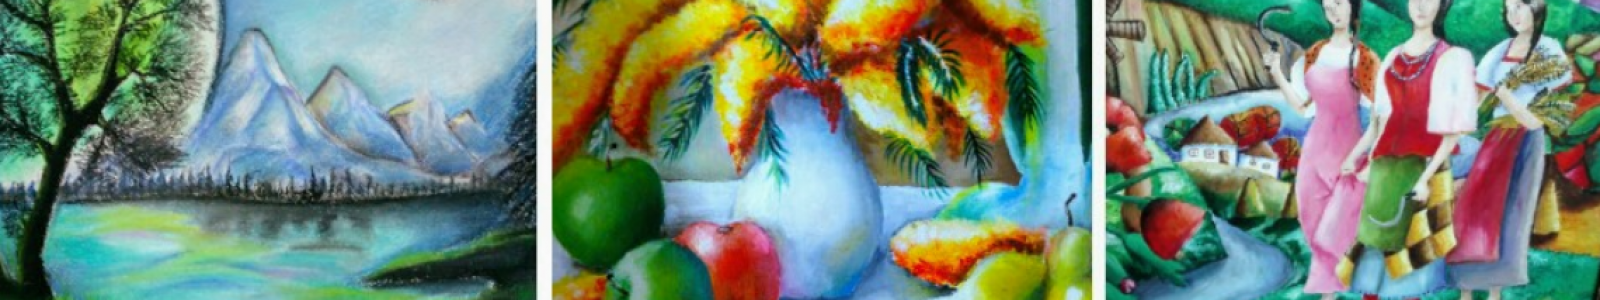 Gallery Painter Danylo Rakovych